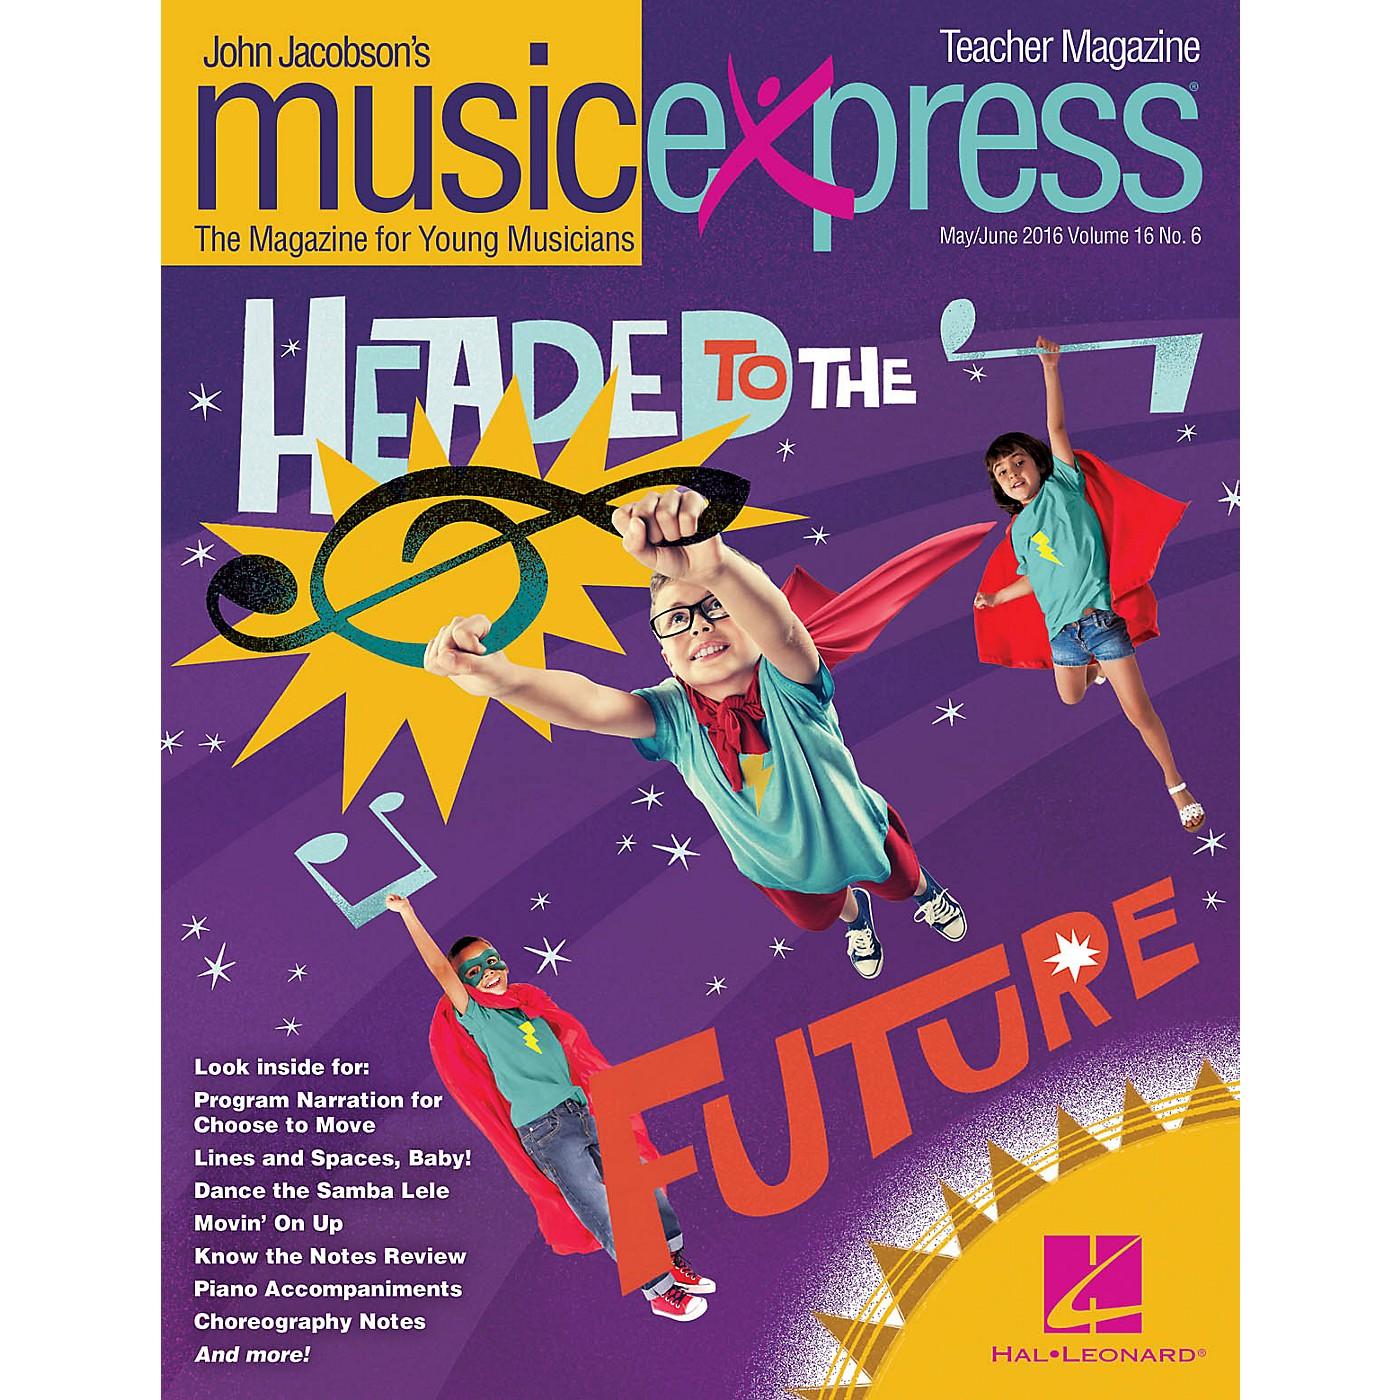 Hal Leonard Headed to the Future Vol. 16 No. 6 Teacher Magazine w/CD by Rachel Platten Arranged by Emily Crocker thumbnail